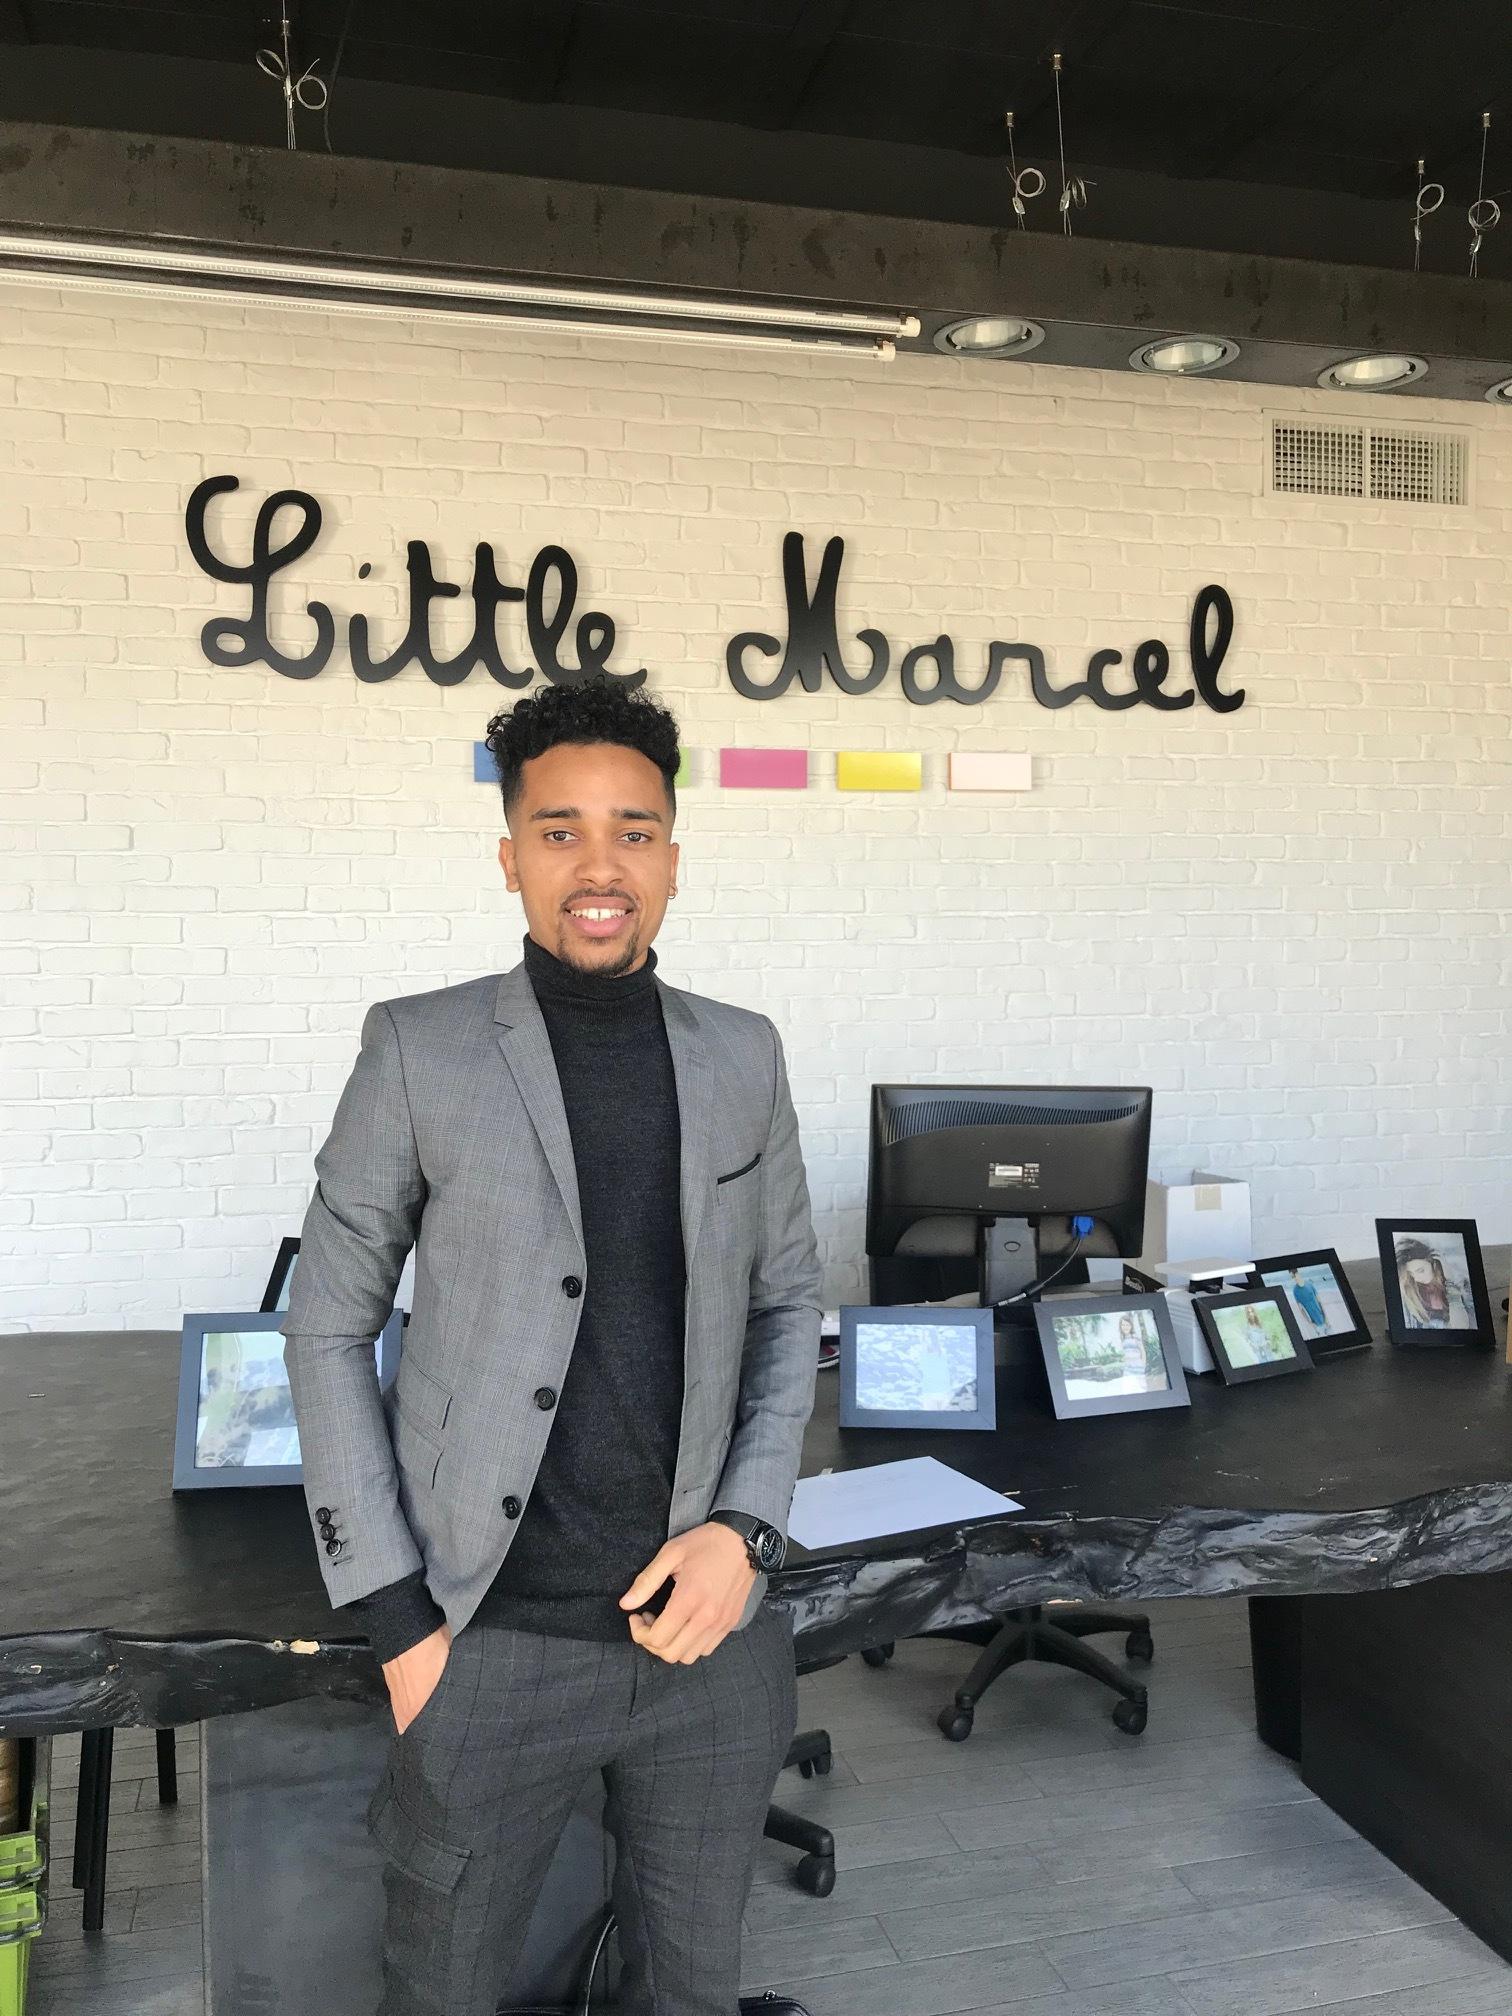 Little Marcel - Repenser sa stratégie digitale